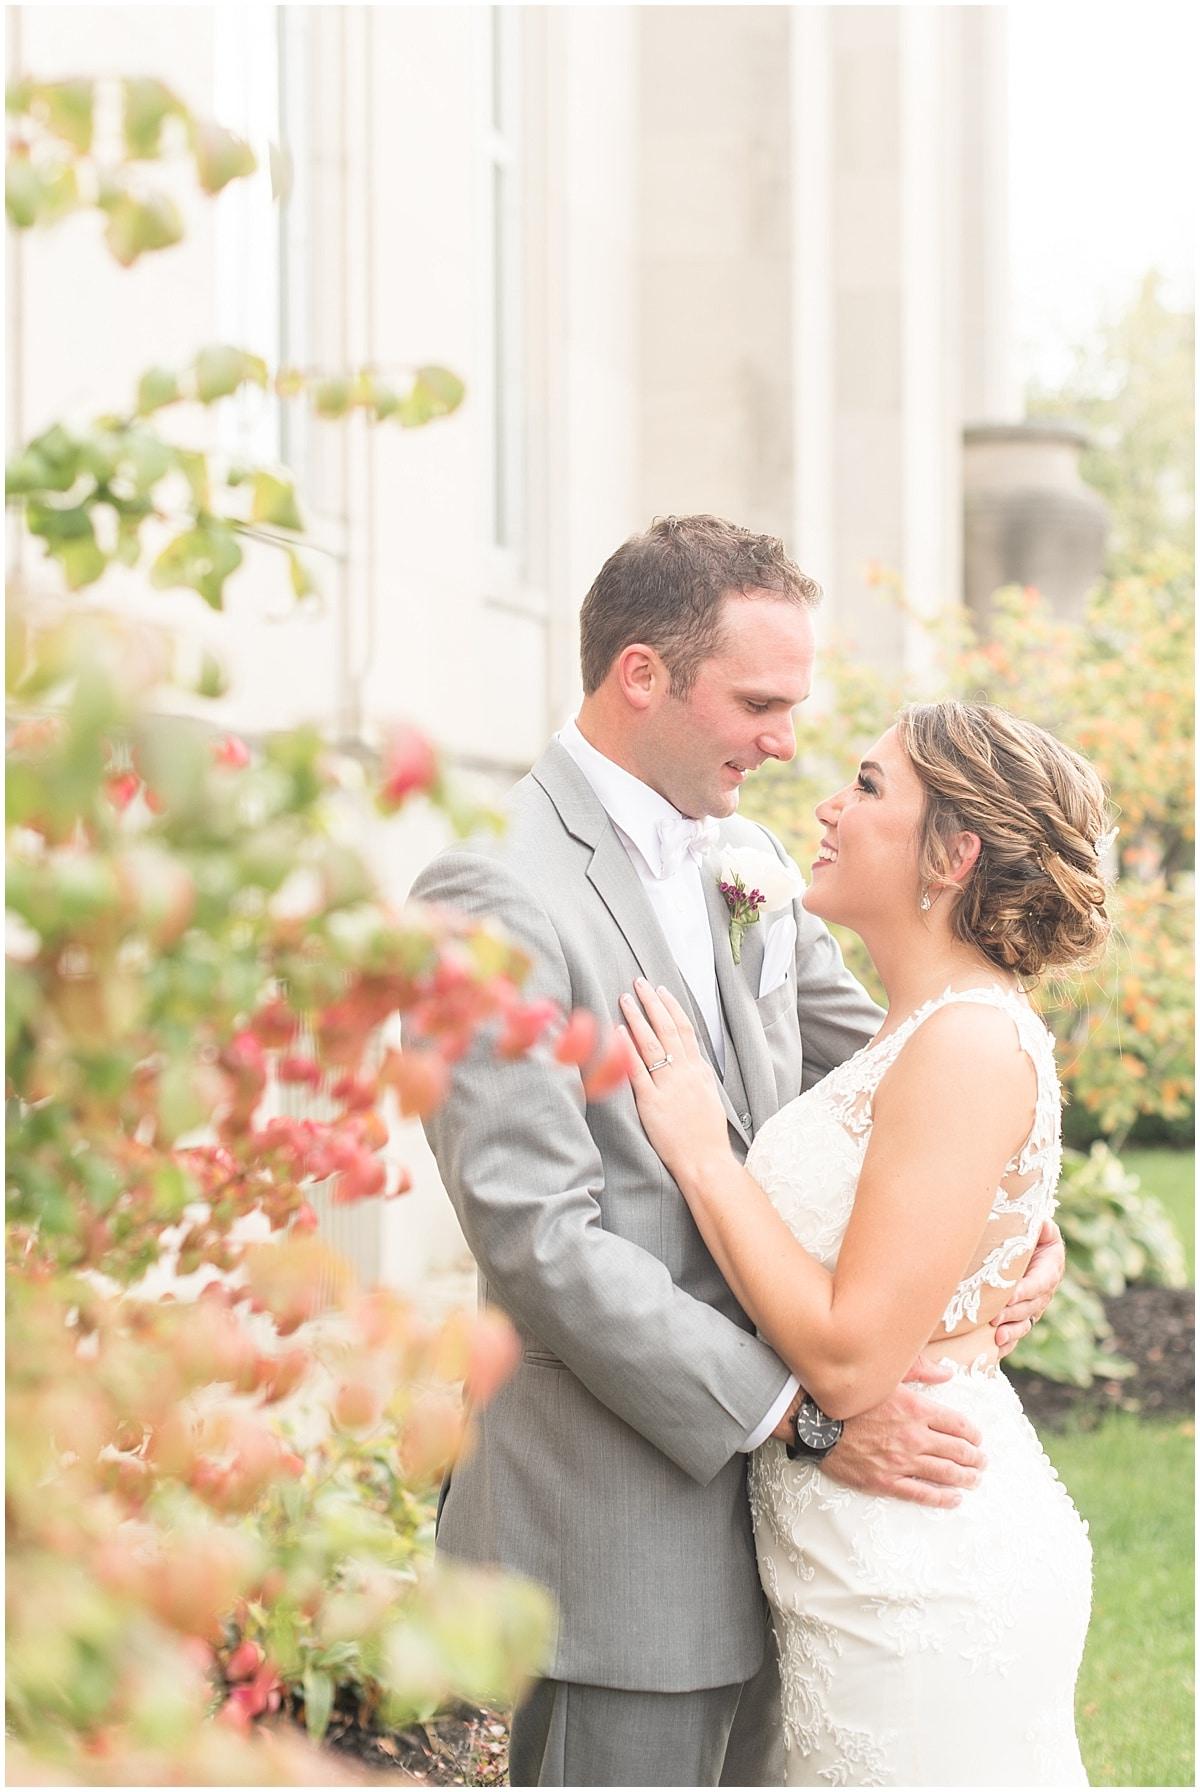 Seward Wedding/ Wedding at the Lahr Atrium in Lafayette, Indiana 5.jpg